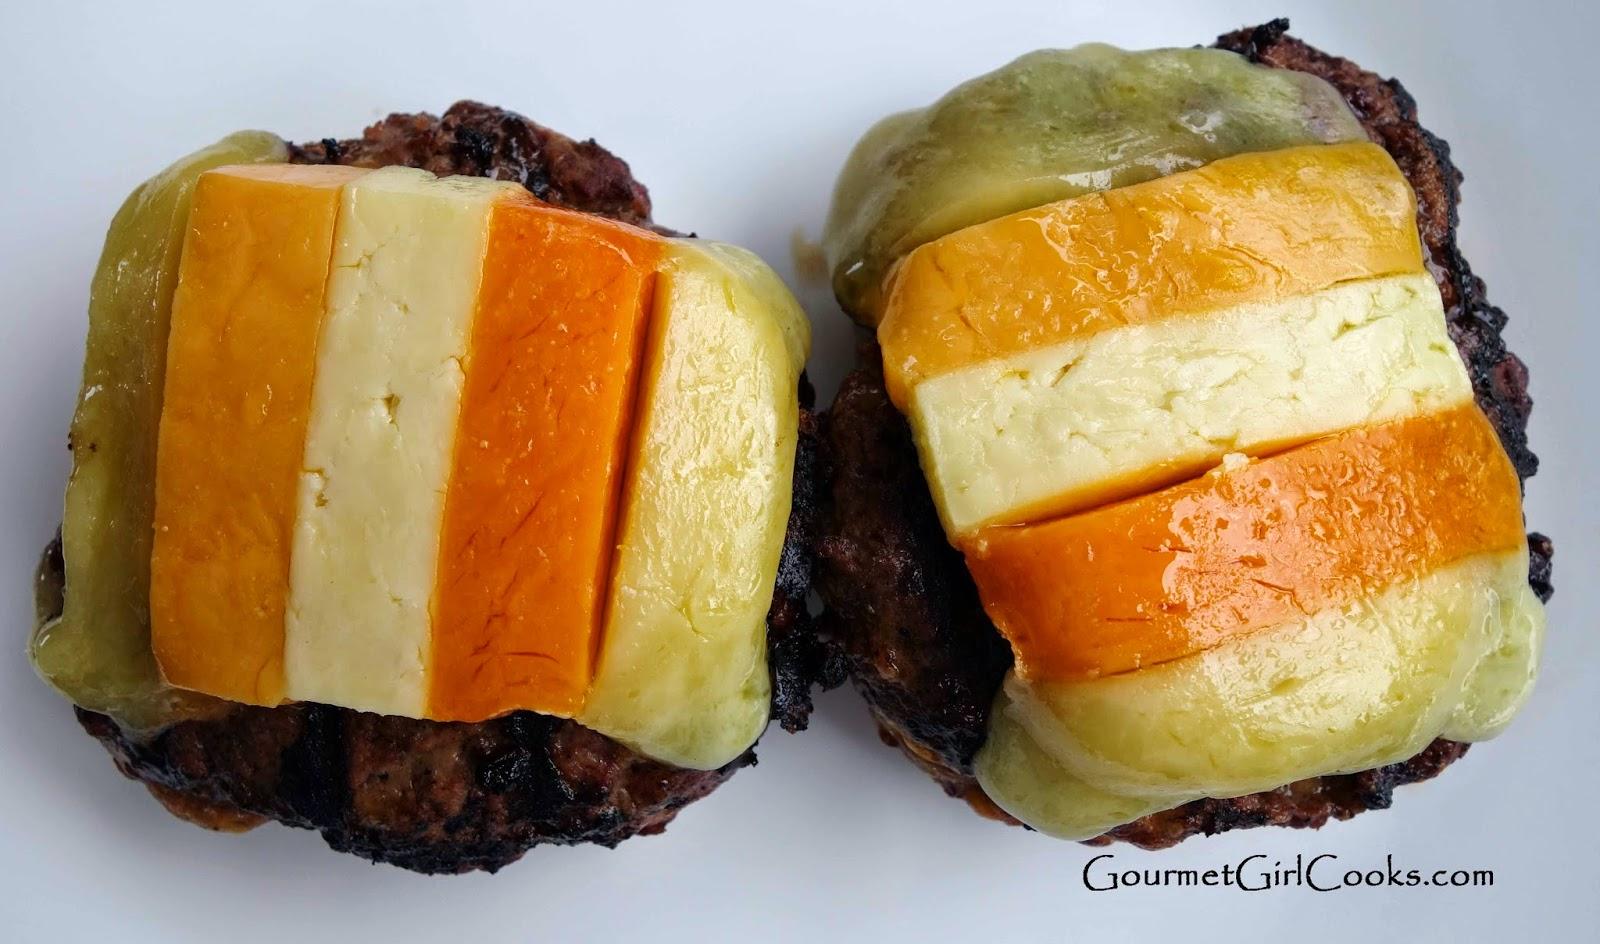 how to put sesame seeds on buns